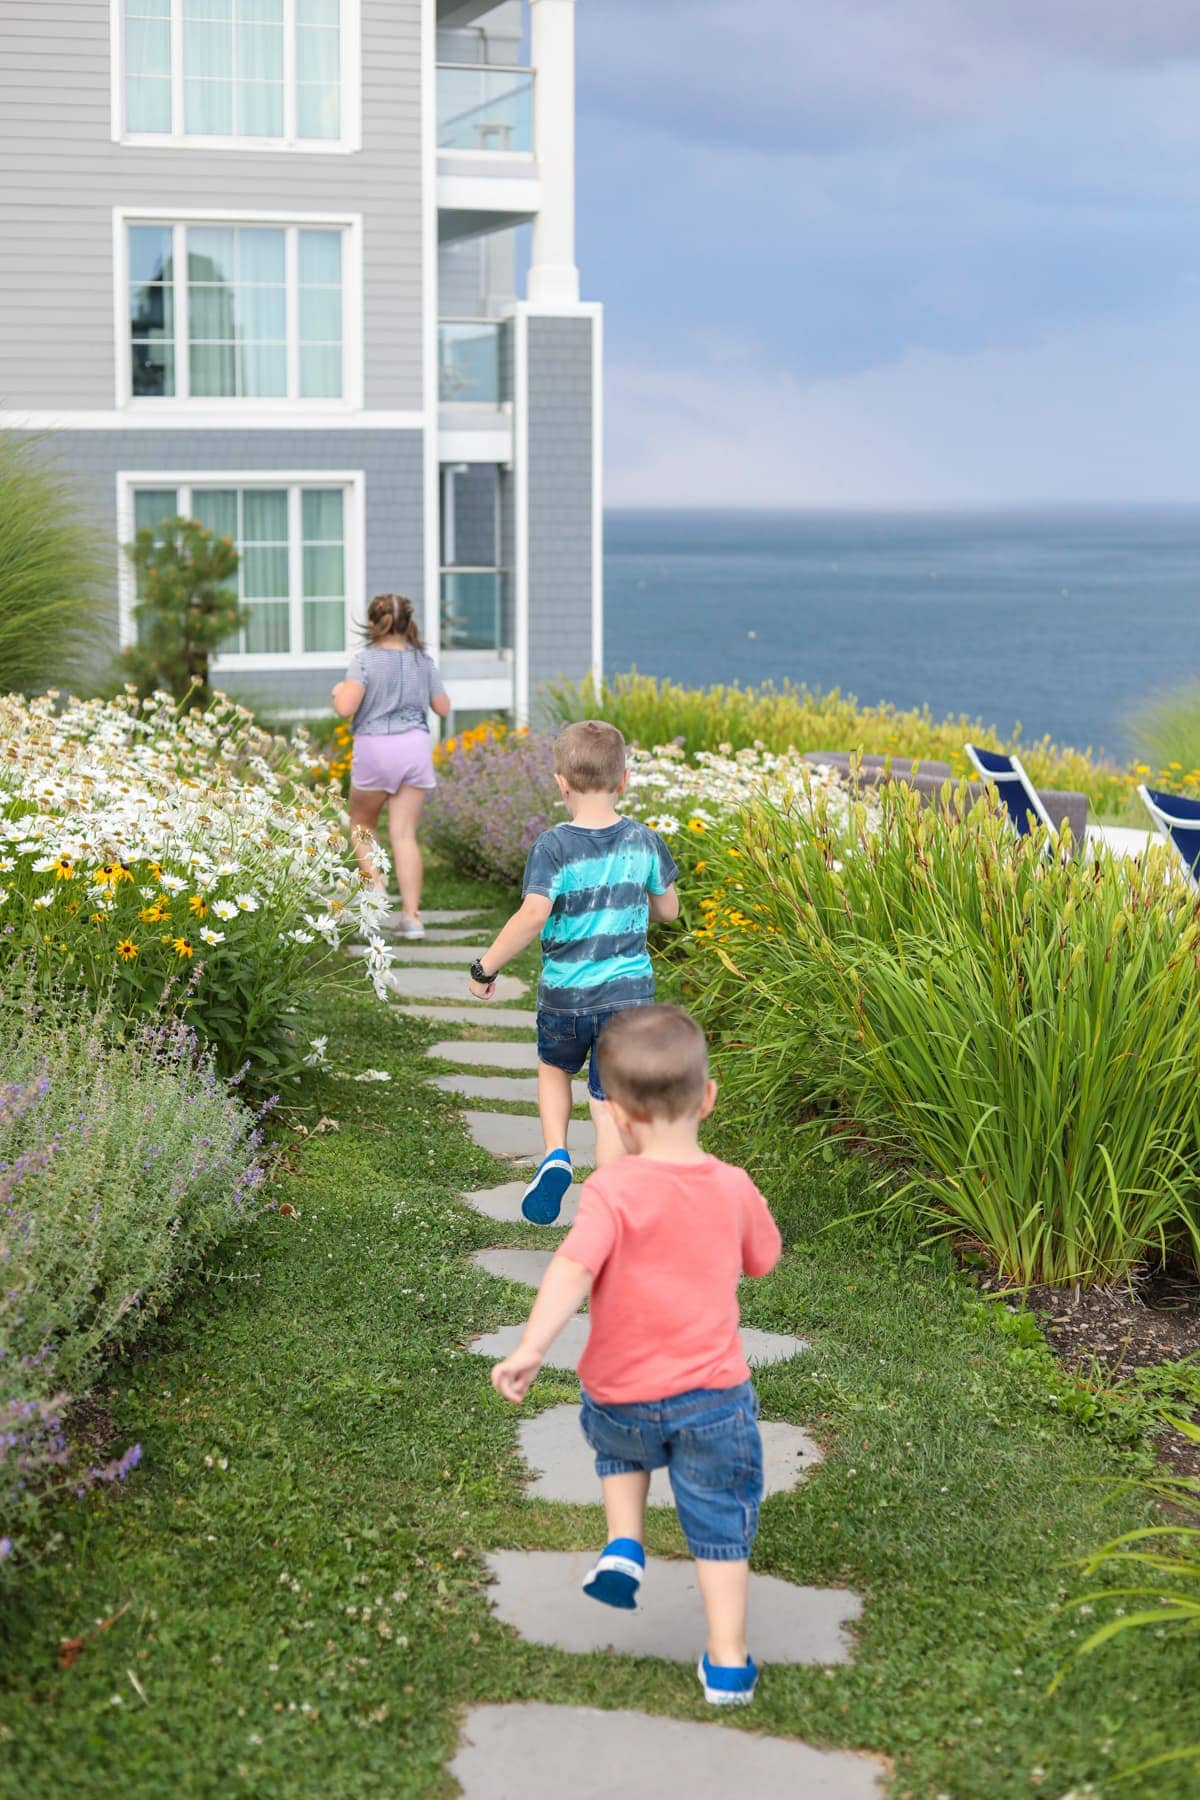 Kids walking on a path